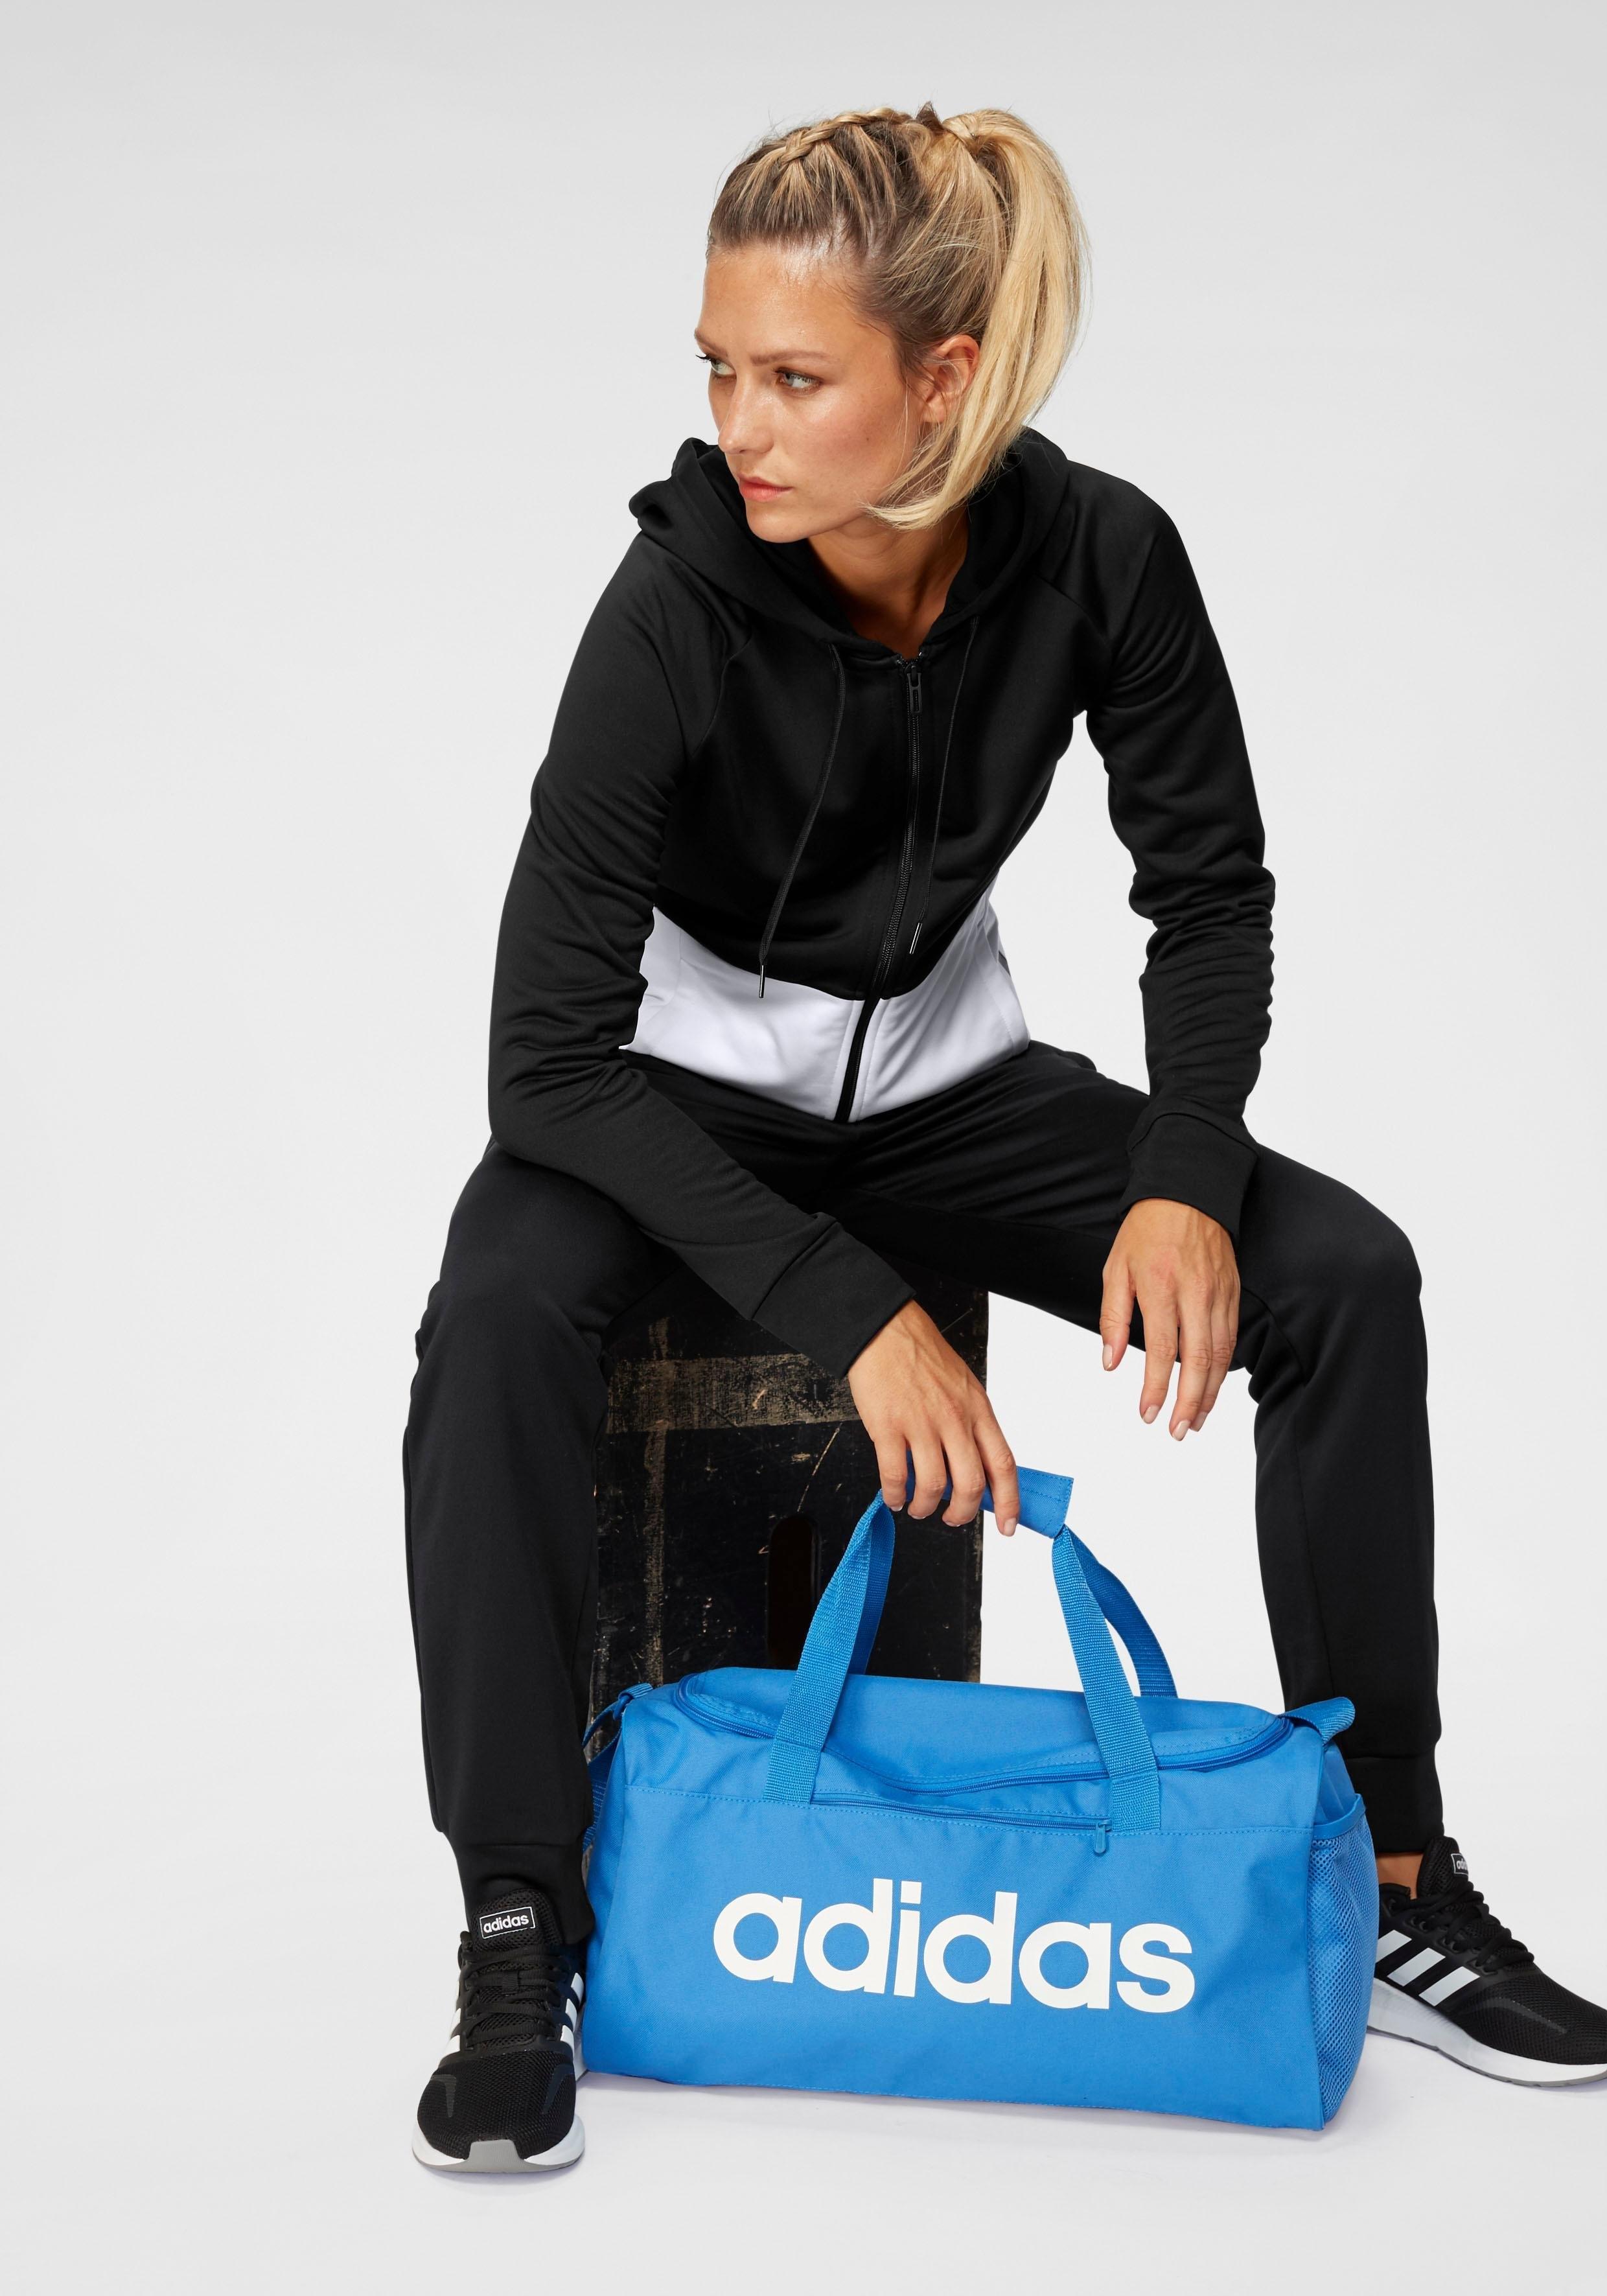 adidas Performance trainingspak (set, 2-delig) goedkoop op otto.nl kopen